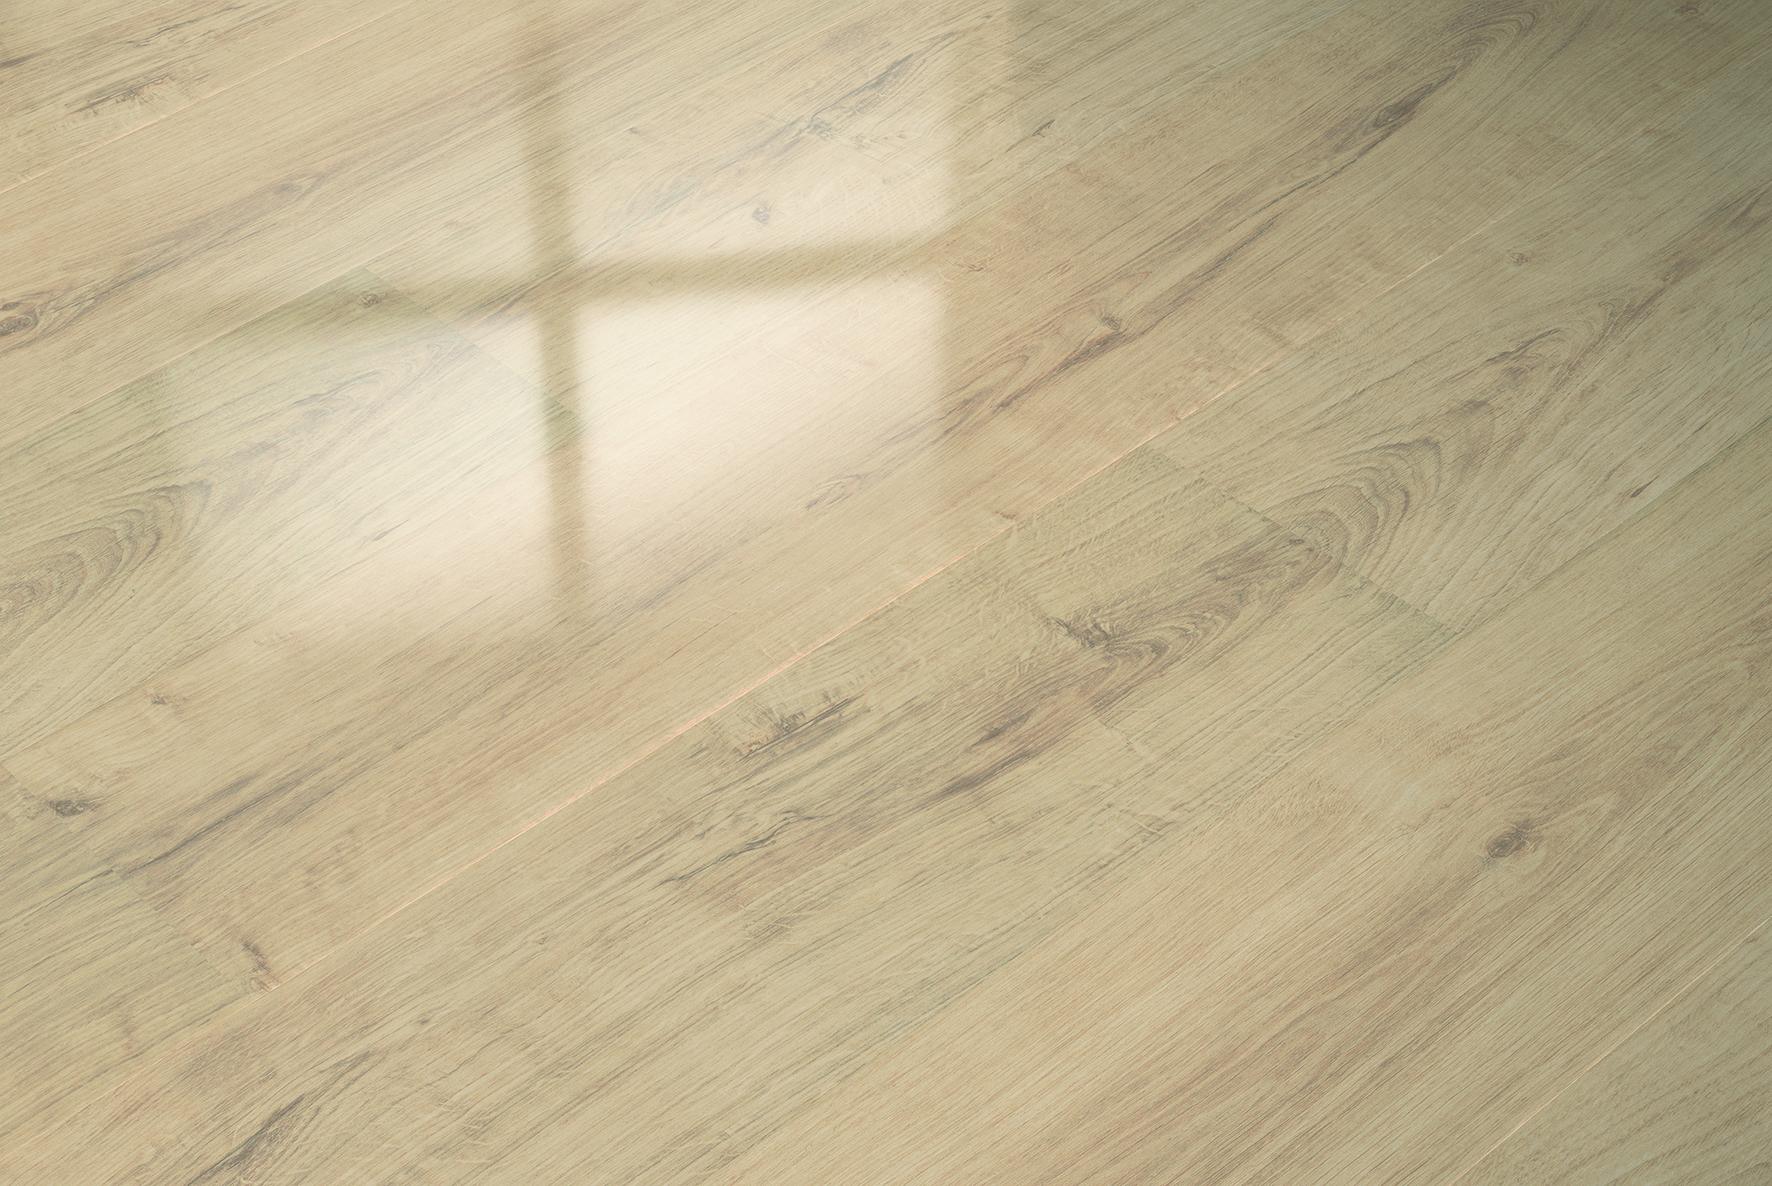 elesgo laminat hochglanz eiche diamant superglanz floor glattkante. Black Bedroom Furniture Sets. Home Design Ideas